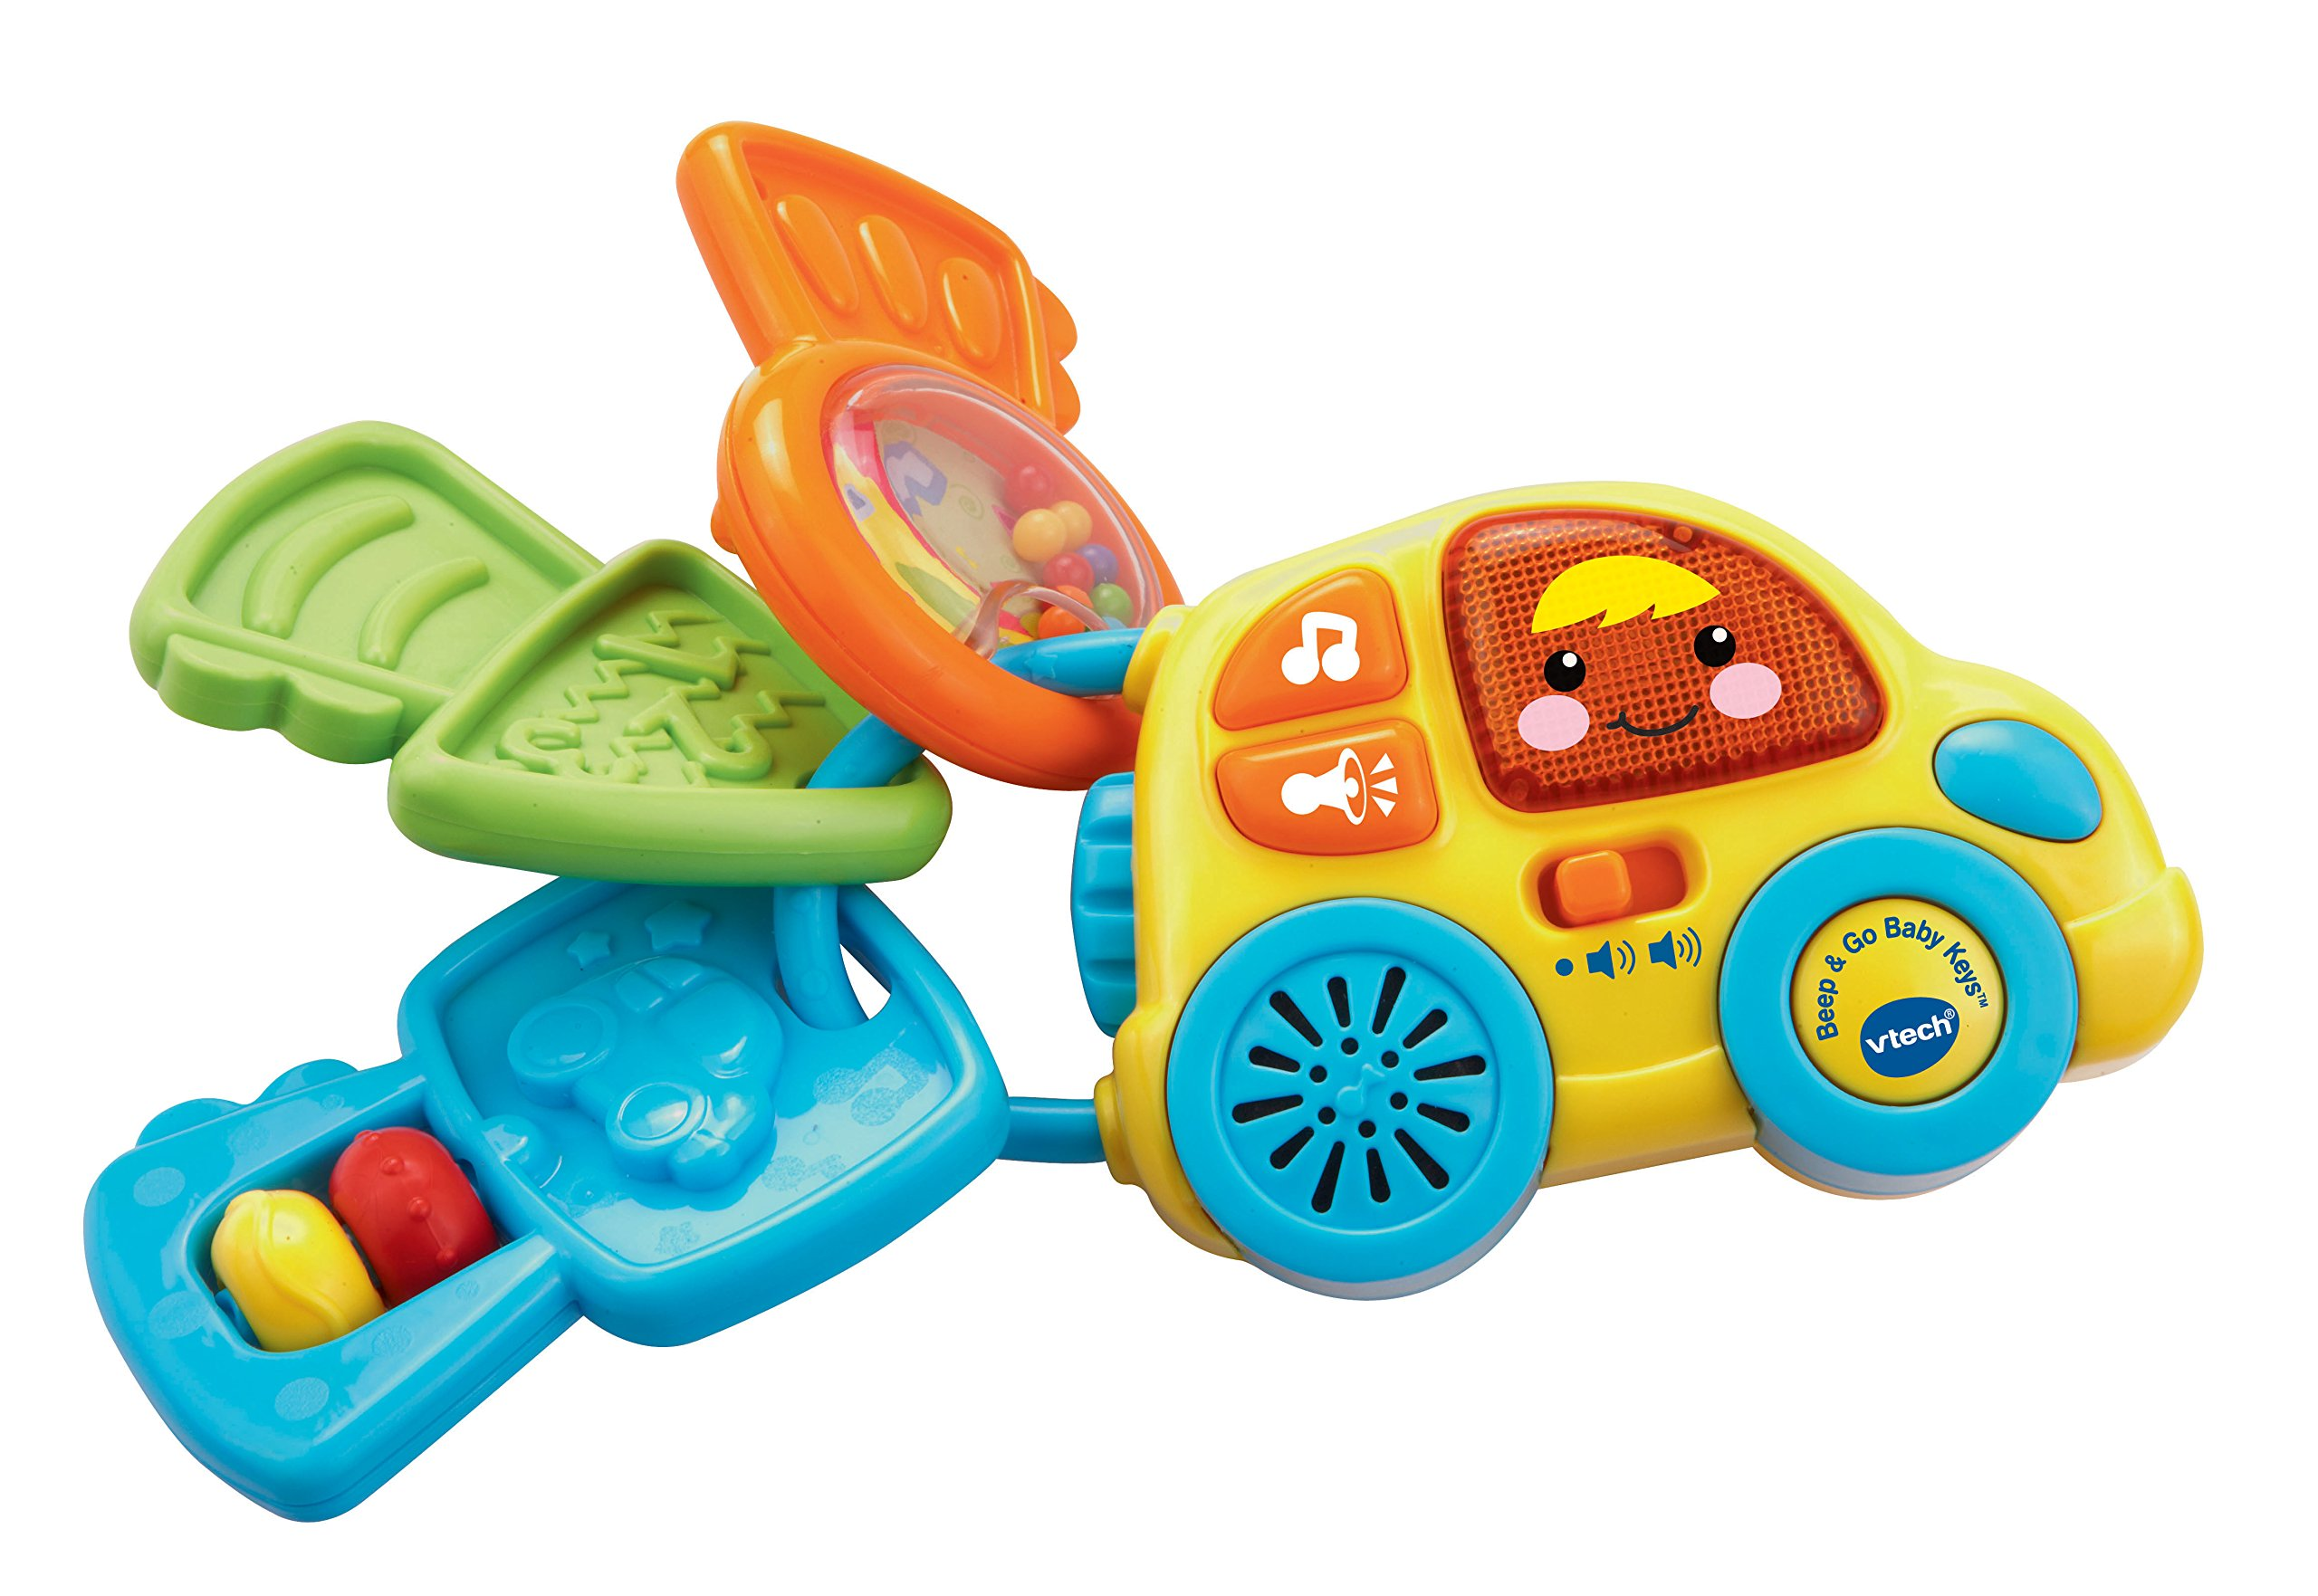 VTech Beep /& Go Baby Keys Multicolor